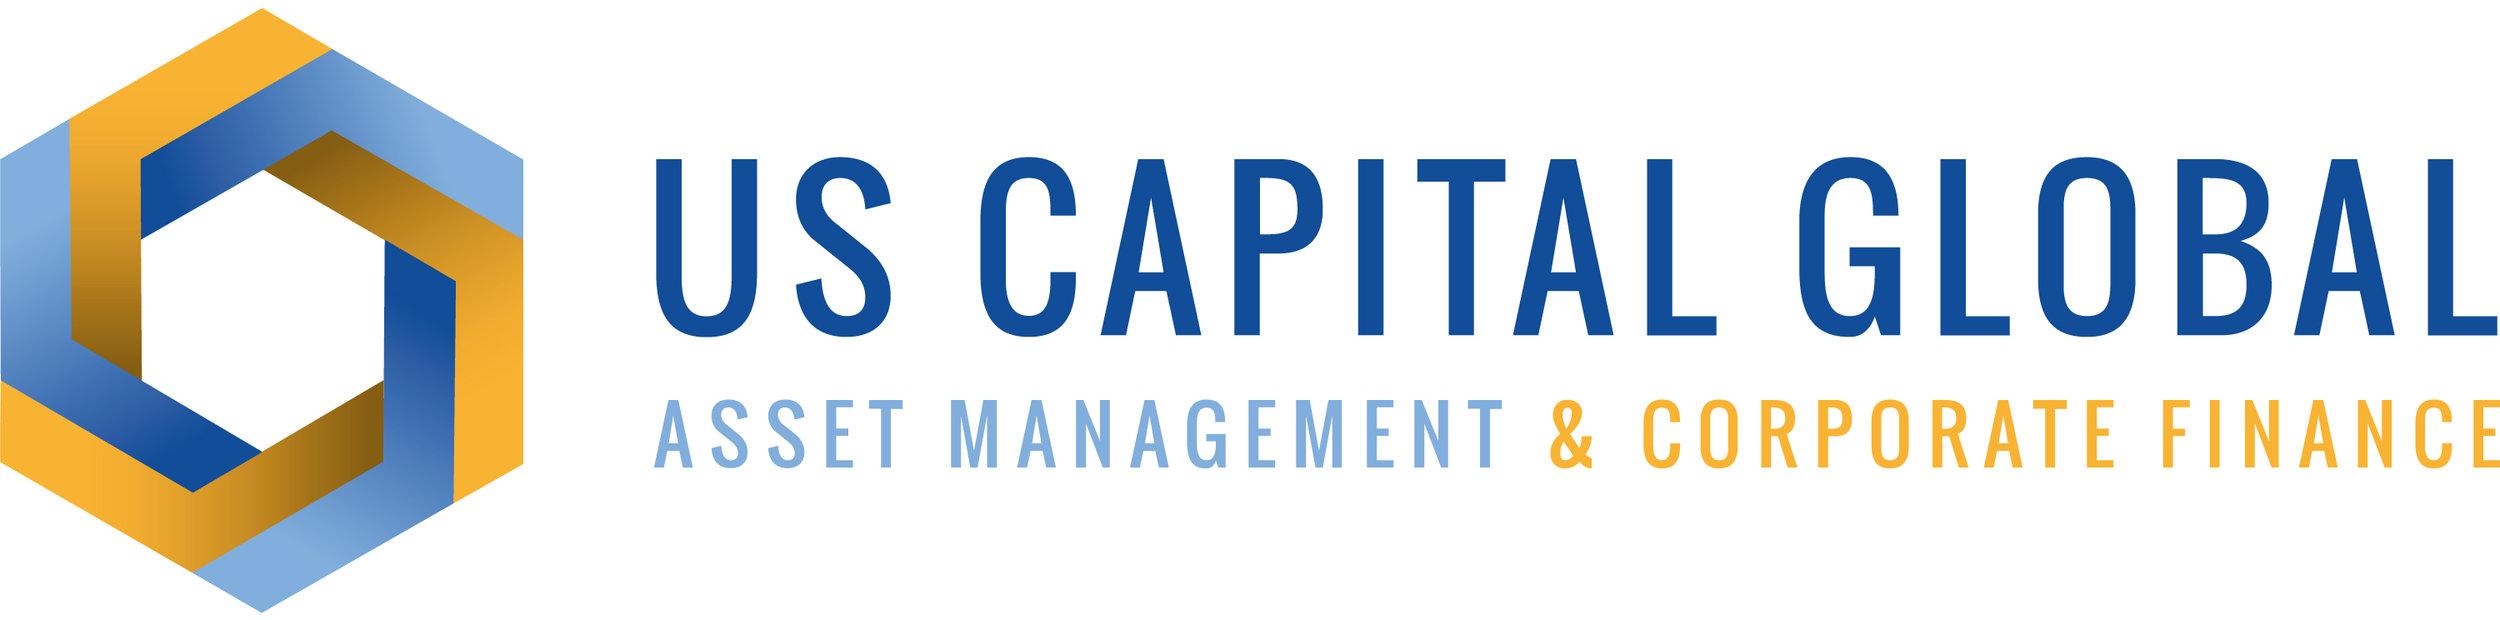 us-capital-global-col-dark.jpg